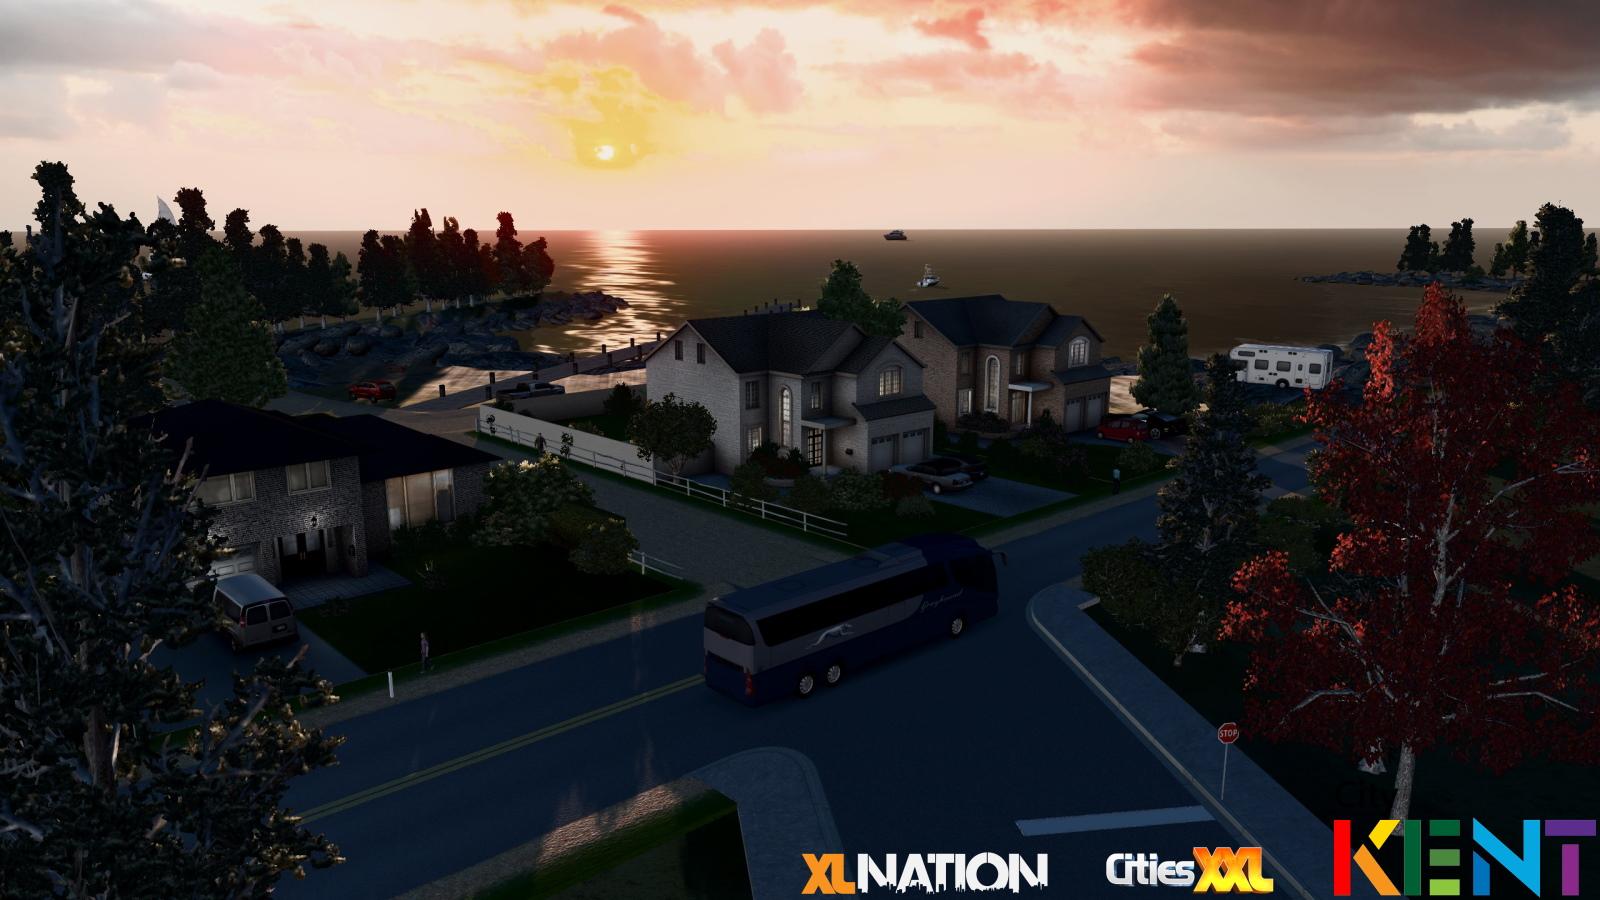 [Cities XXL] Kent - Page 2 Abraham-island_kent15_xln_citiesxxl-jpg